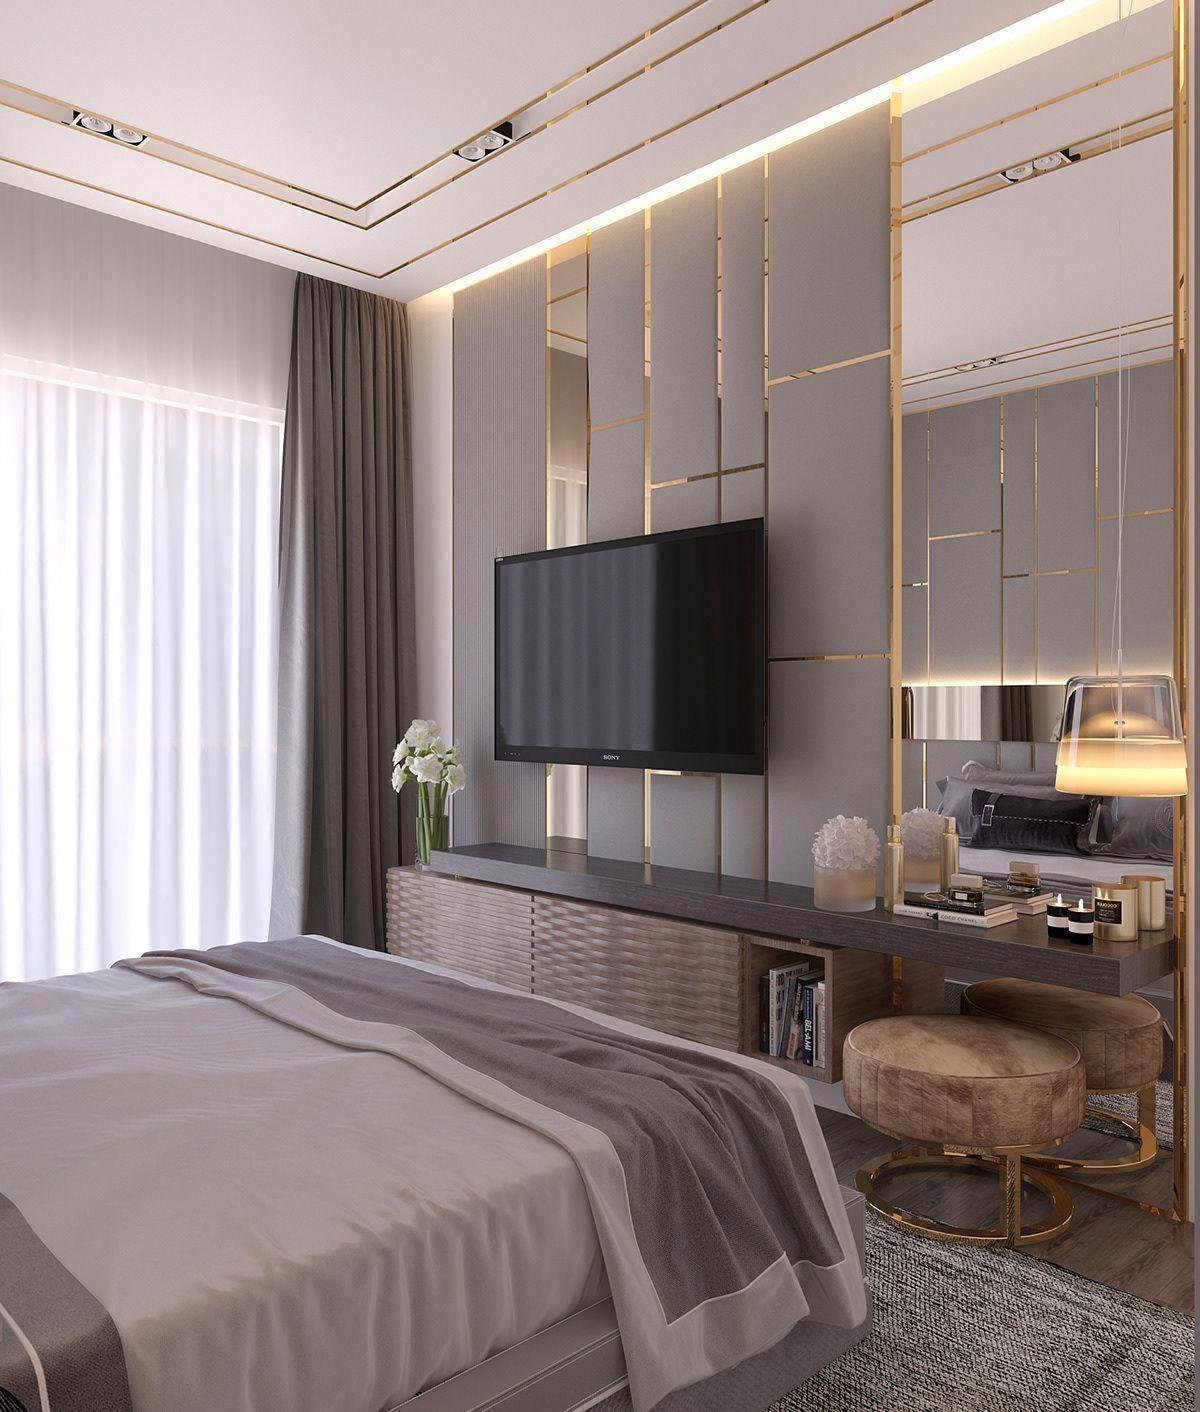 Luxury Master Bedroom Dubai On Behance: Modern Style Bedroom *Dubai Project On Behance